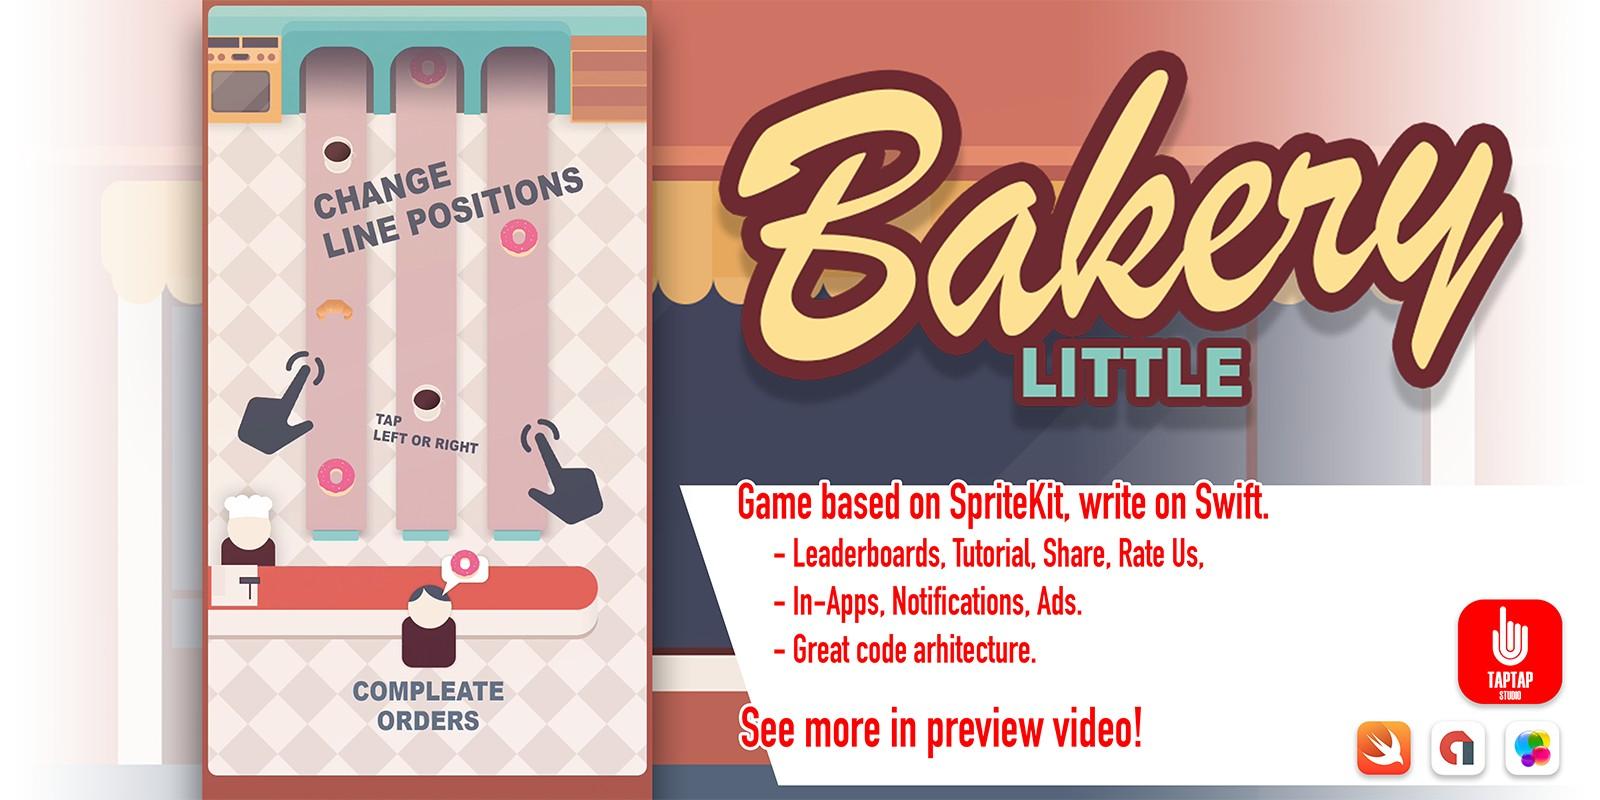 Little Bakery - iOS Source Code